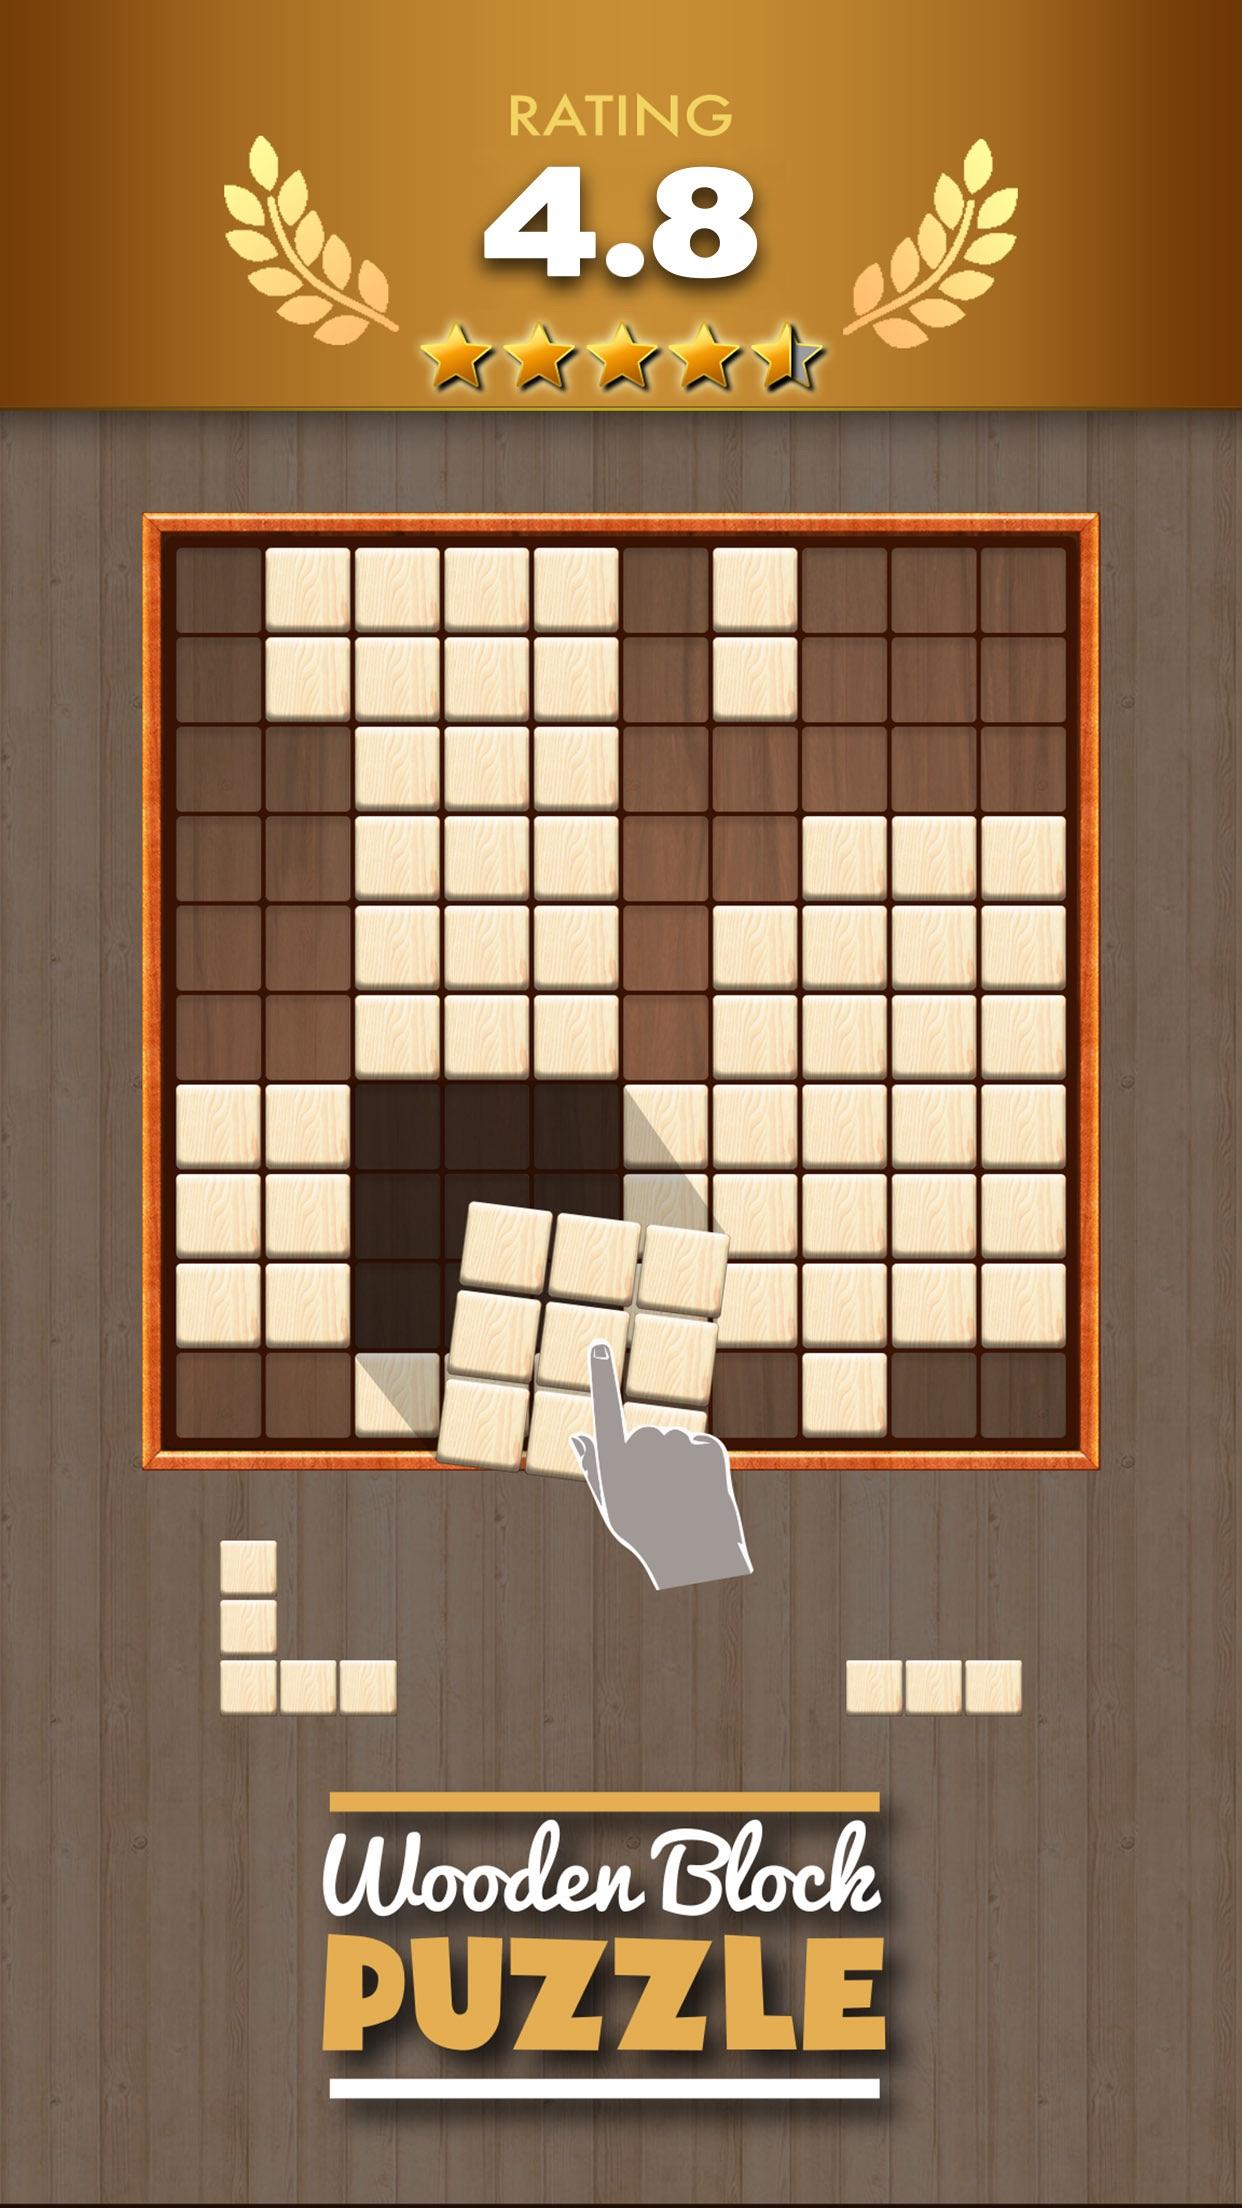 Wooden Block Puzzle Game Screenshot